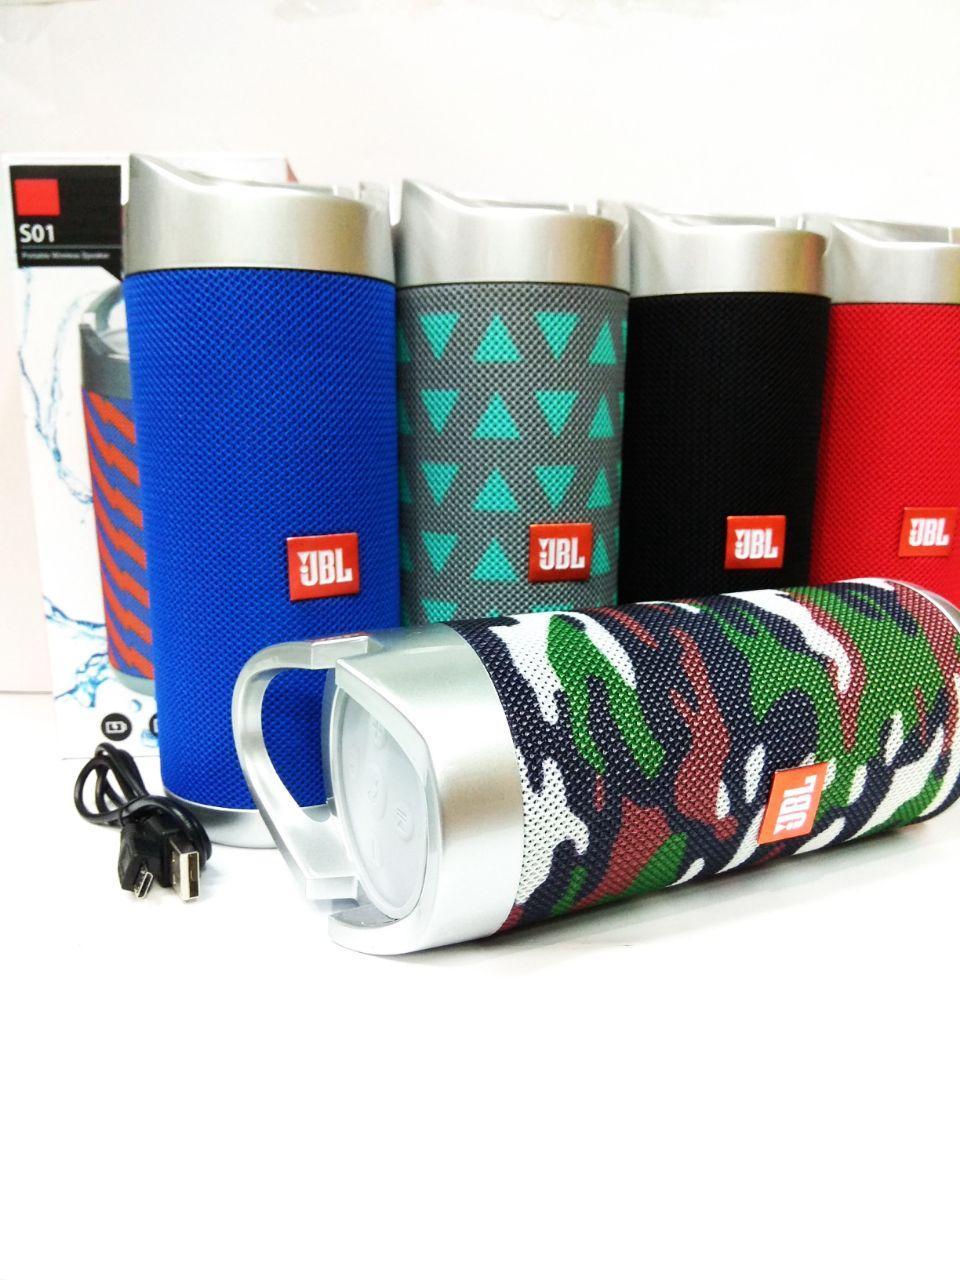 Buy Sell Cheapest Jbl Speaker Bluetooth Best Quality Product Deals Flip 2 Portable Merah S01